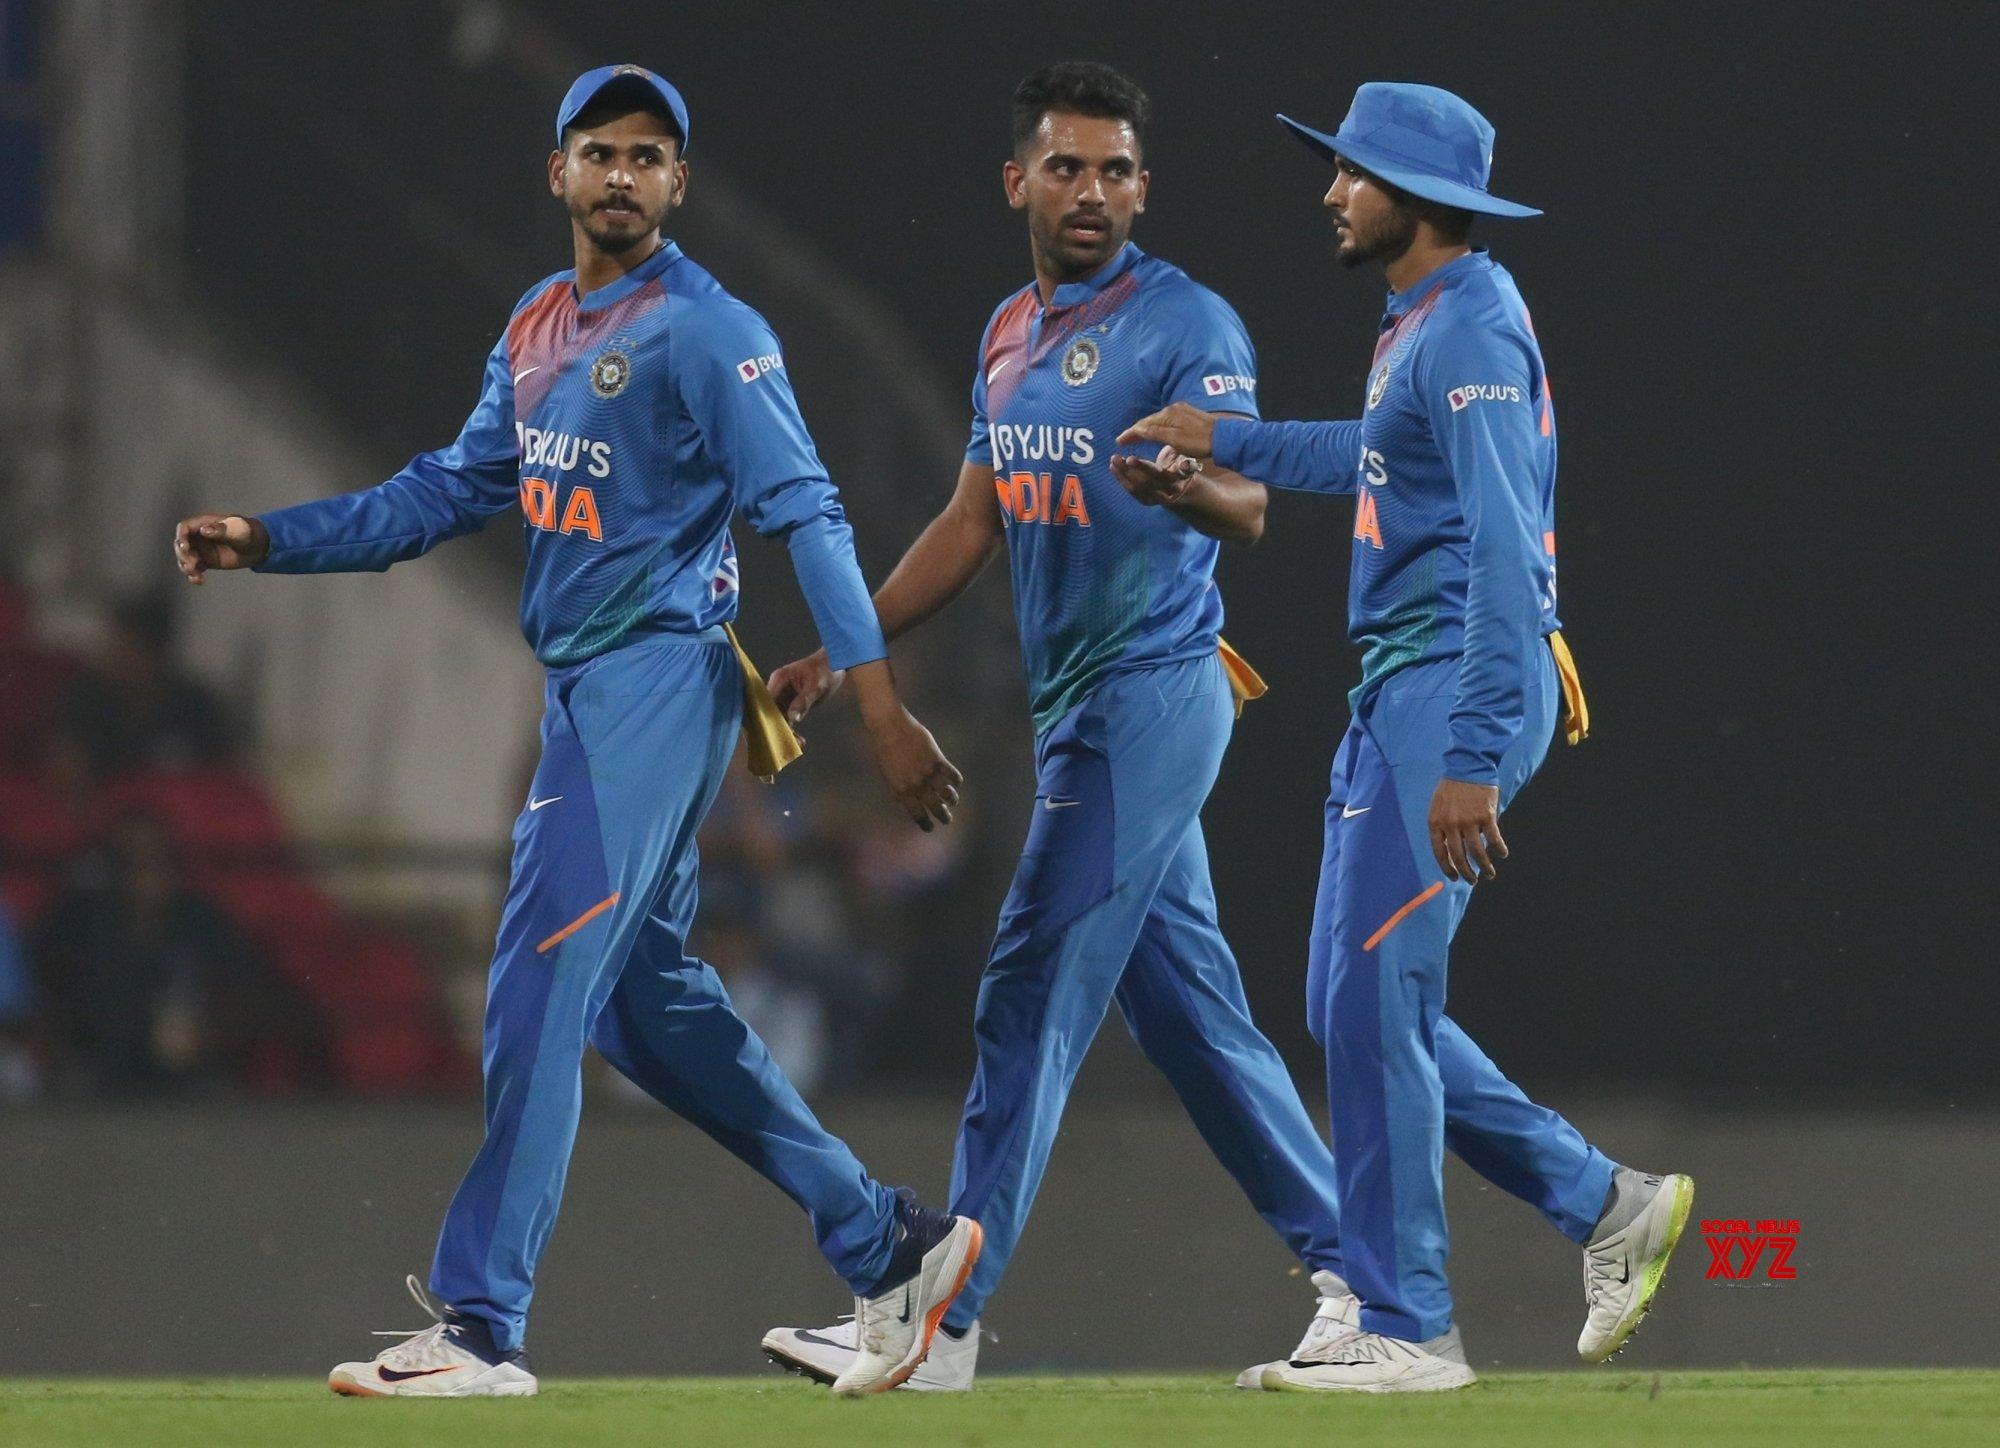 Nagpur: 3rd T20I - India Vs Bangladesh (Batch - 14) #Gallery